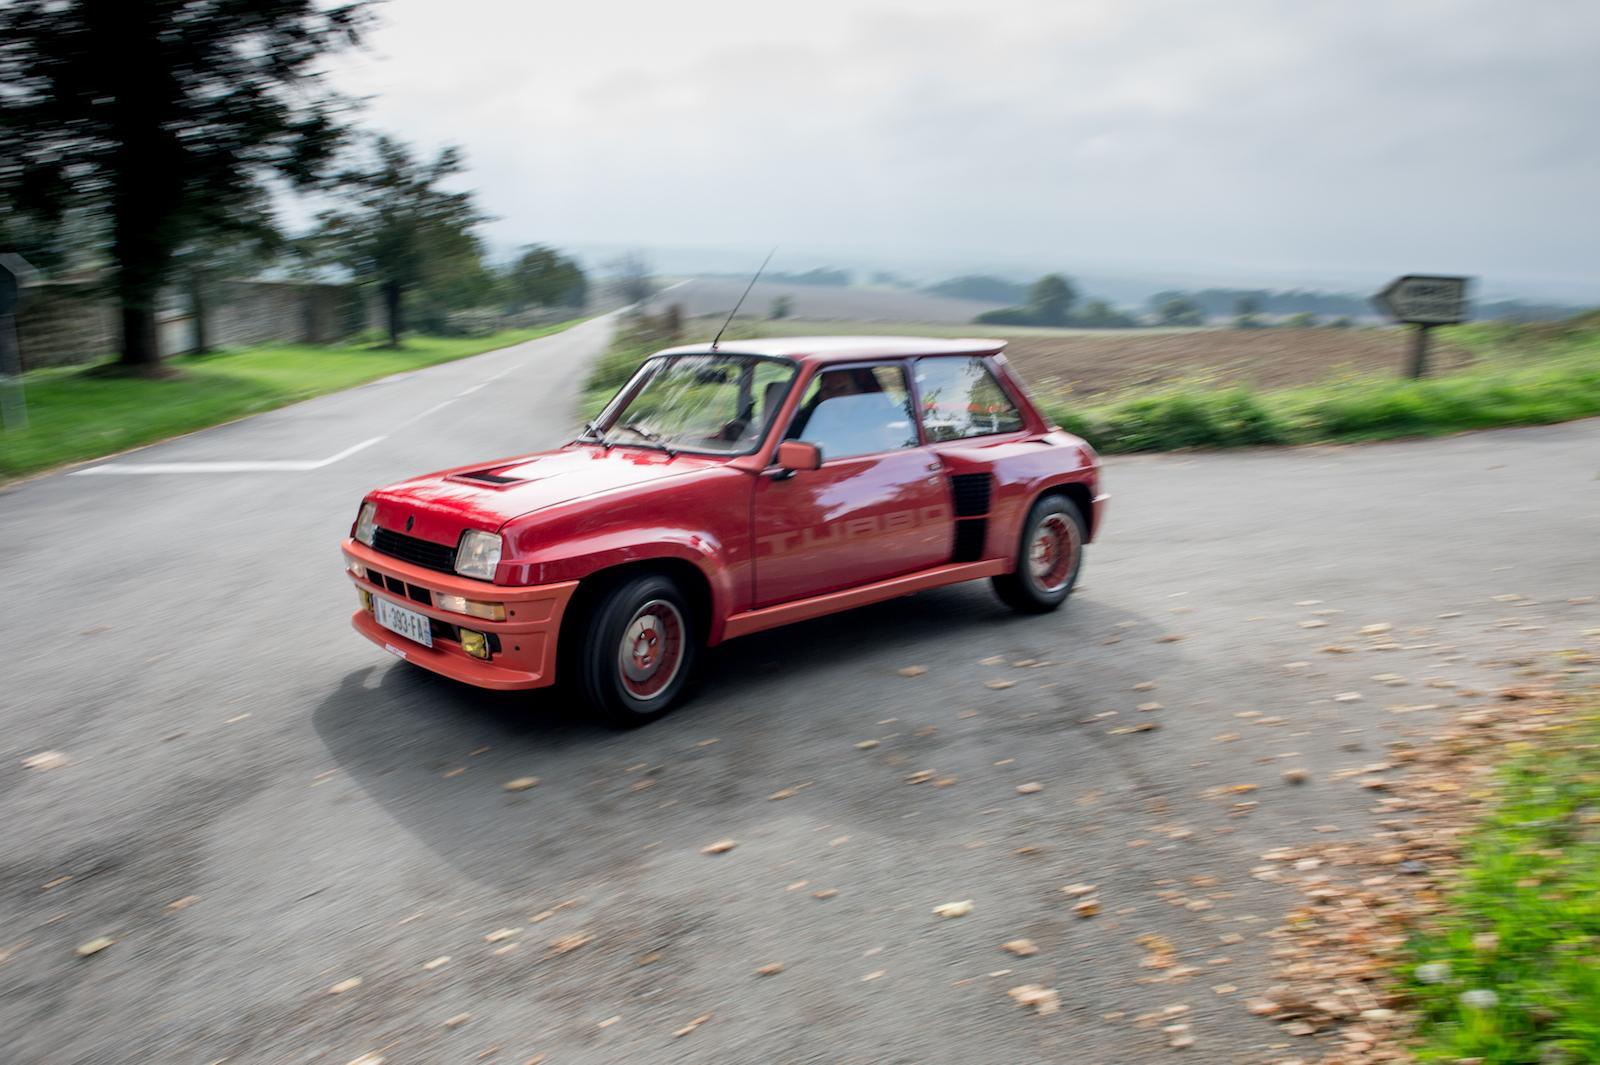 Ragnotti drives Renault 5 Turbo 1 (sideways)